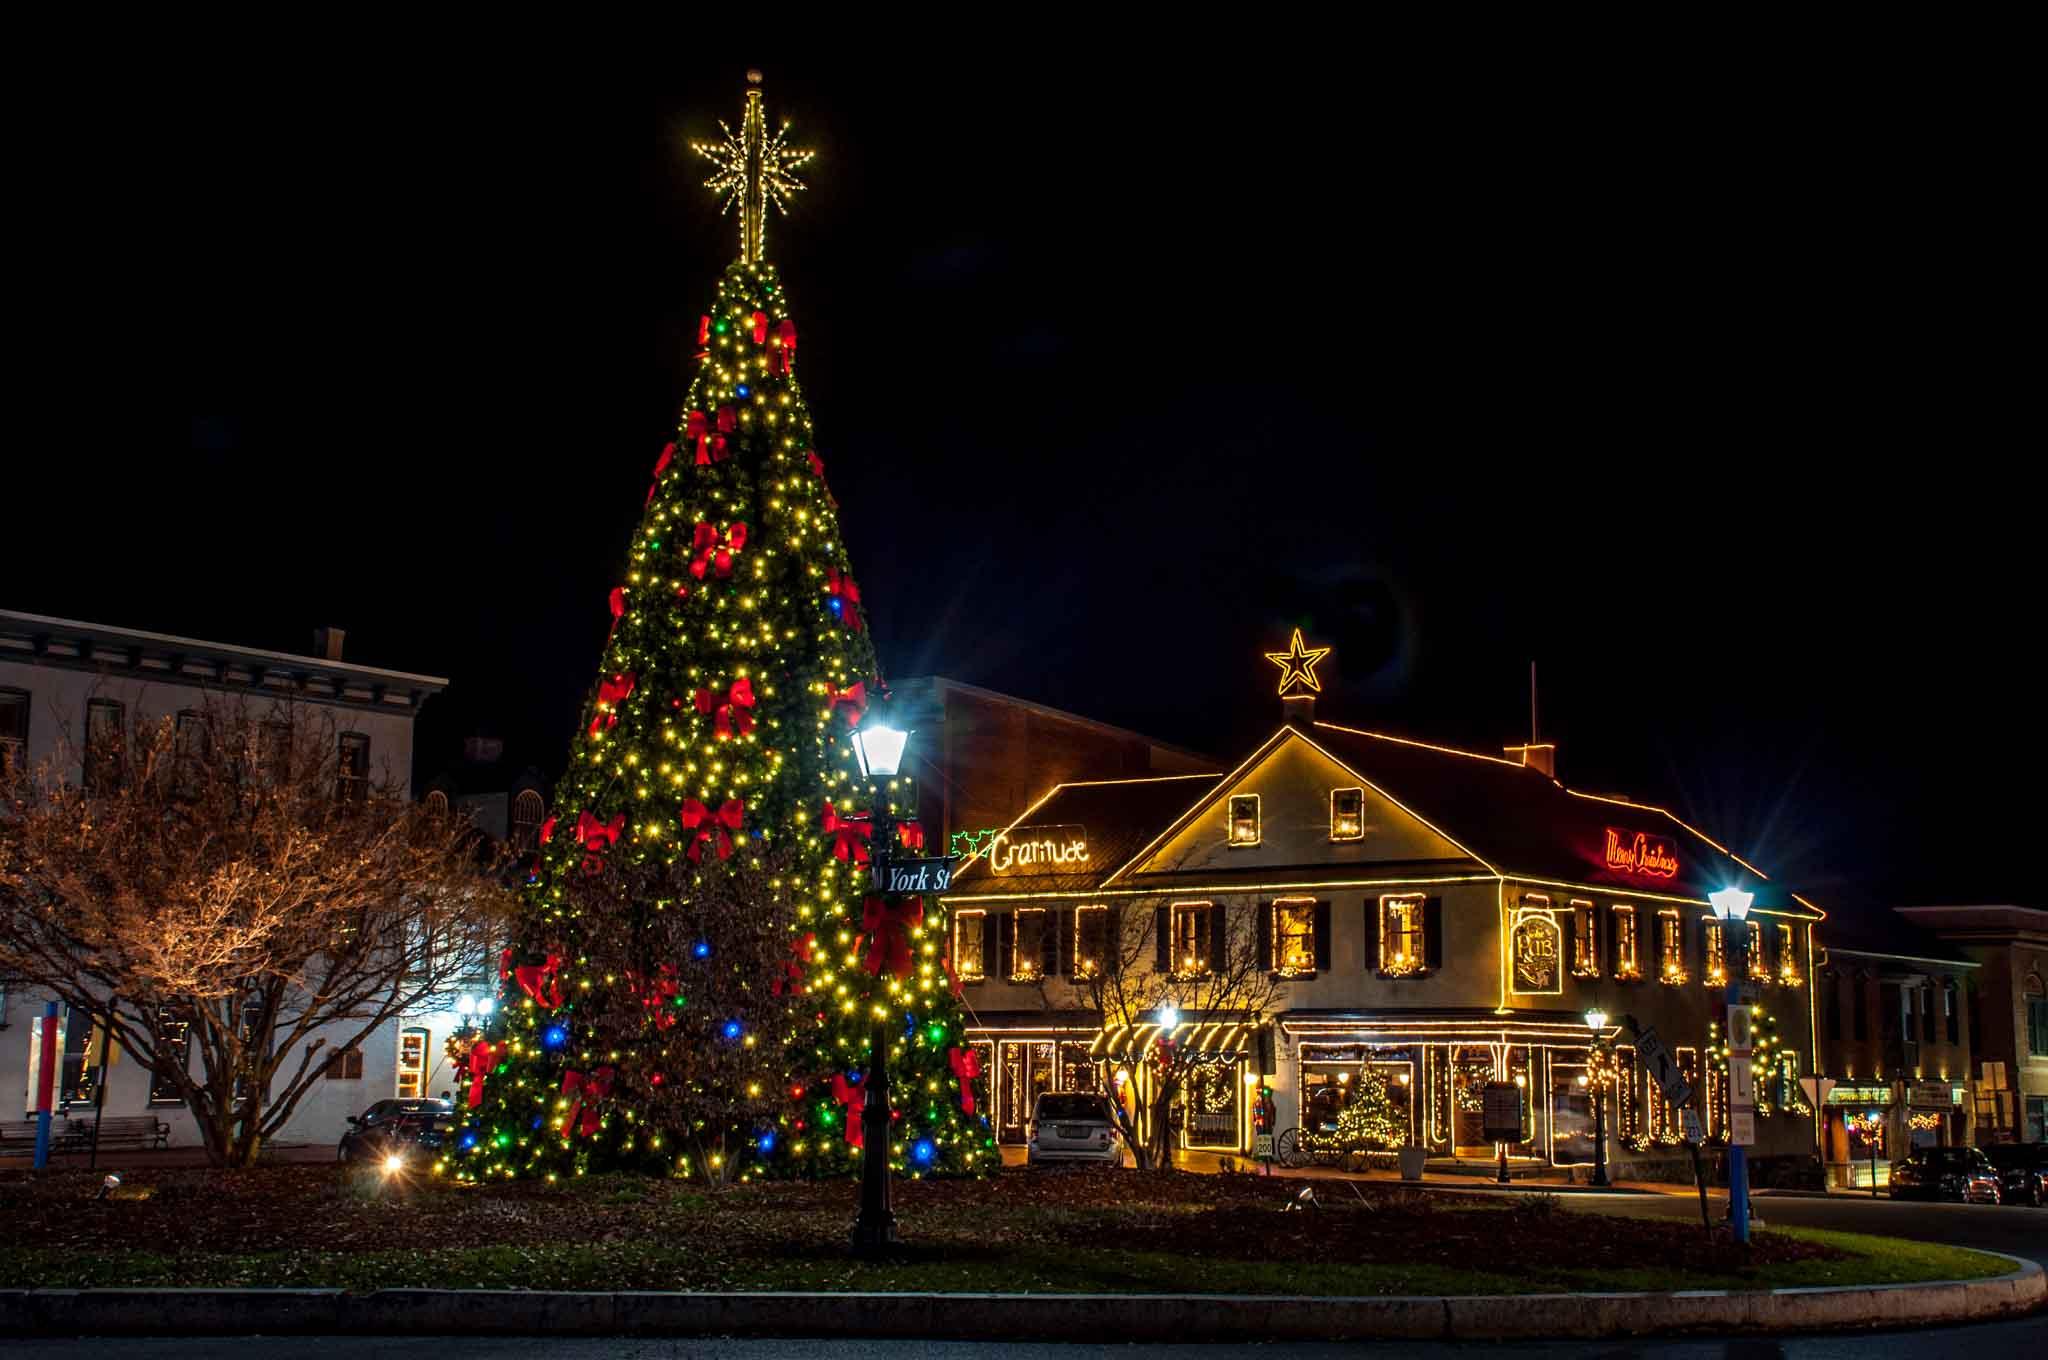 Christmas tree and buildings lit up for Christmas